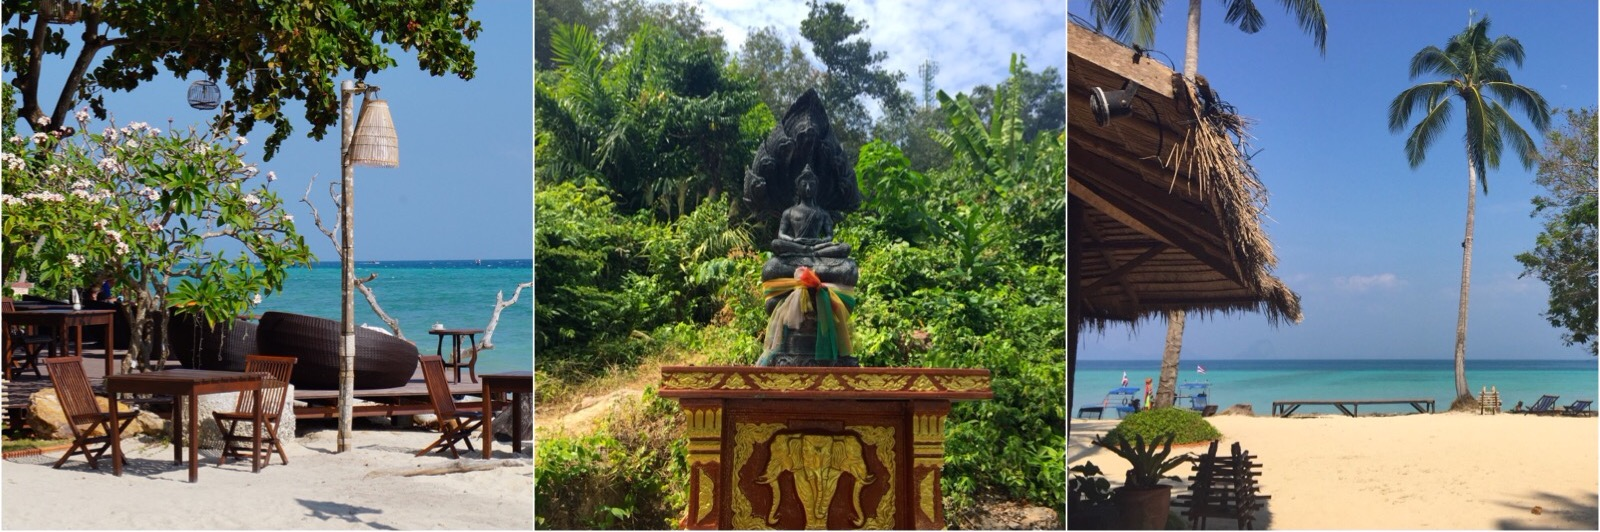 Bounty eiland Koh Ngai